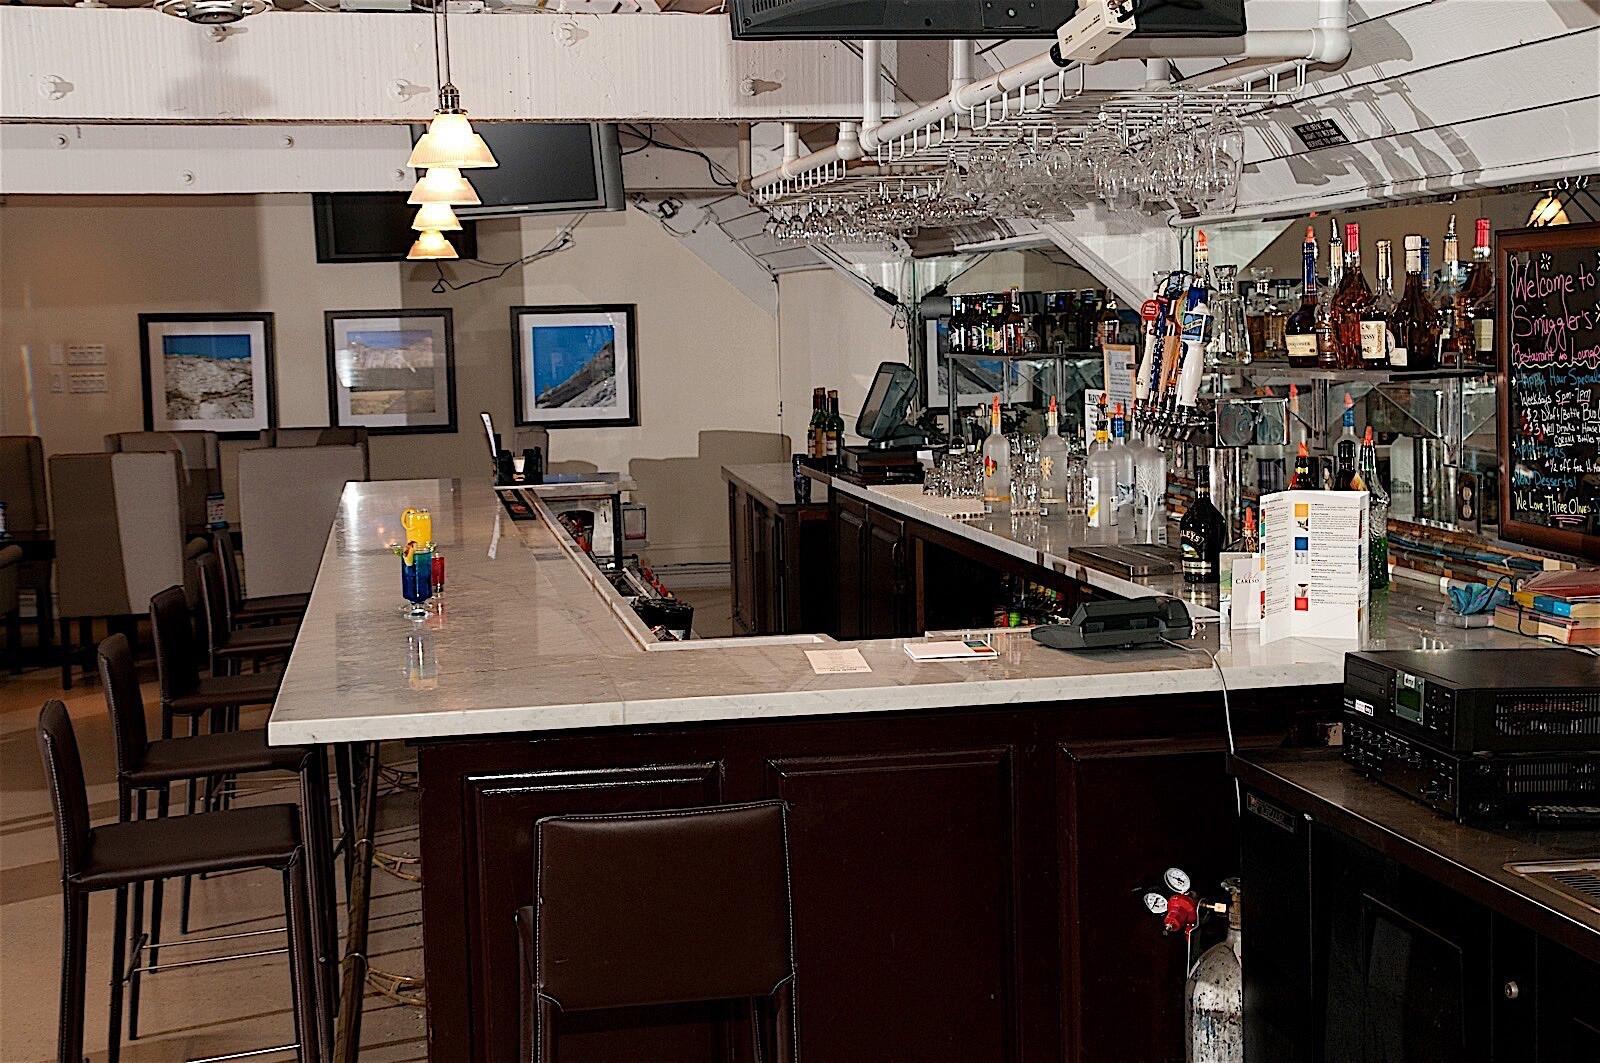 Hotel Fresno Lobby Bar